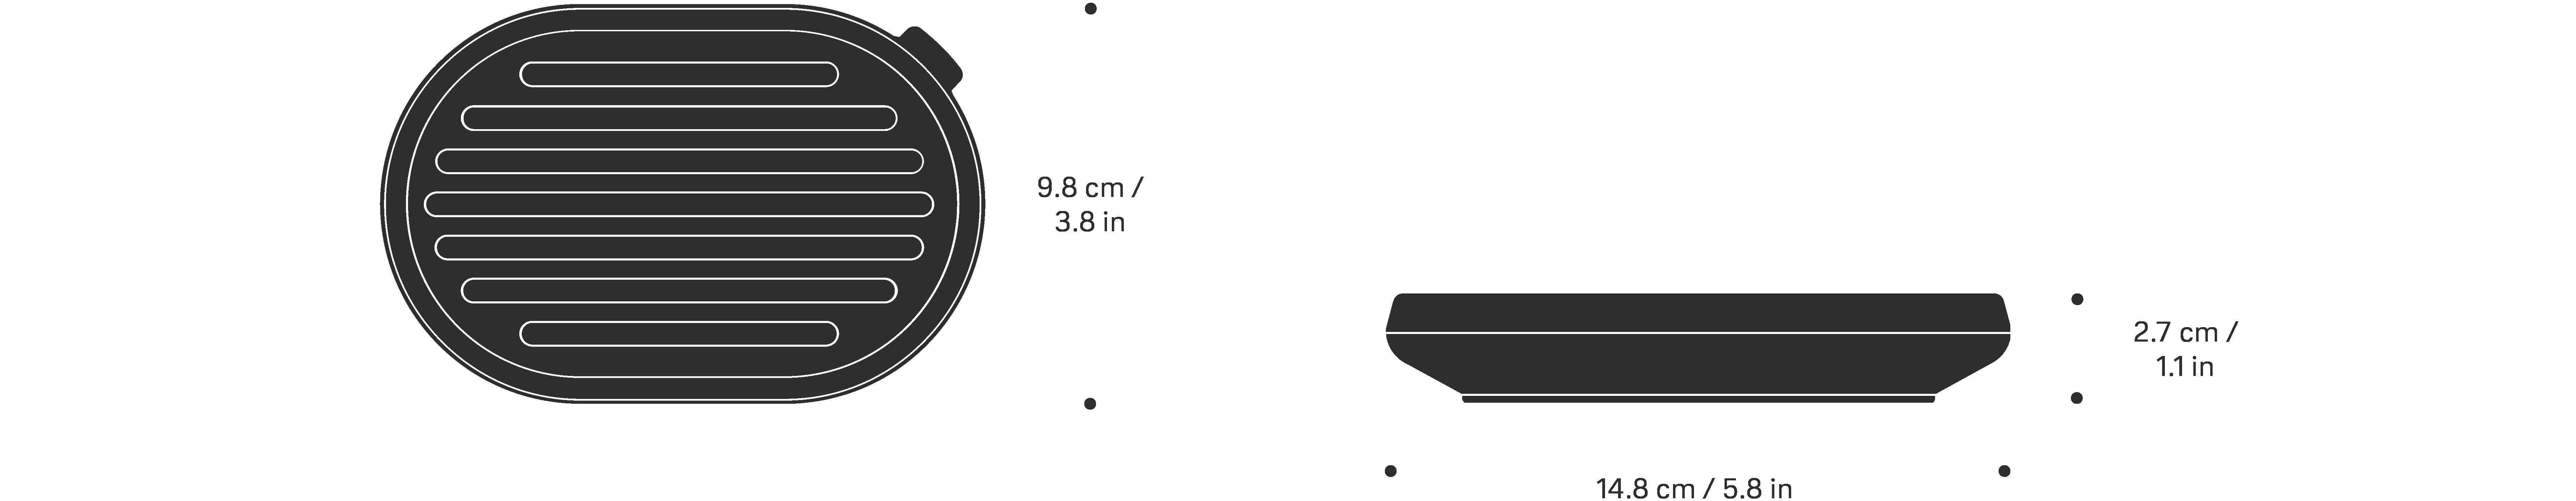 vipp5 størrelse